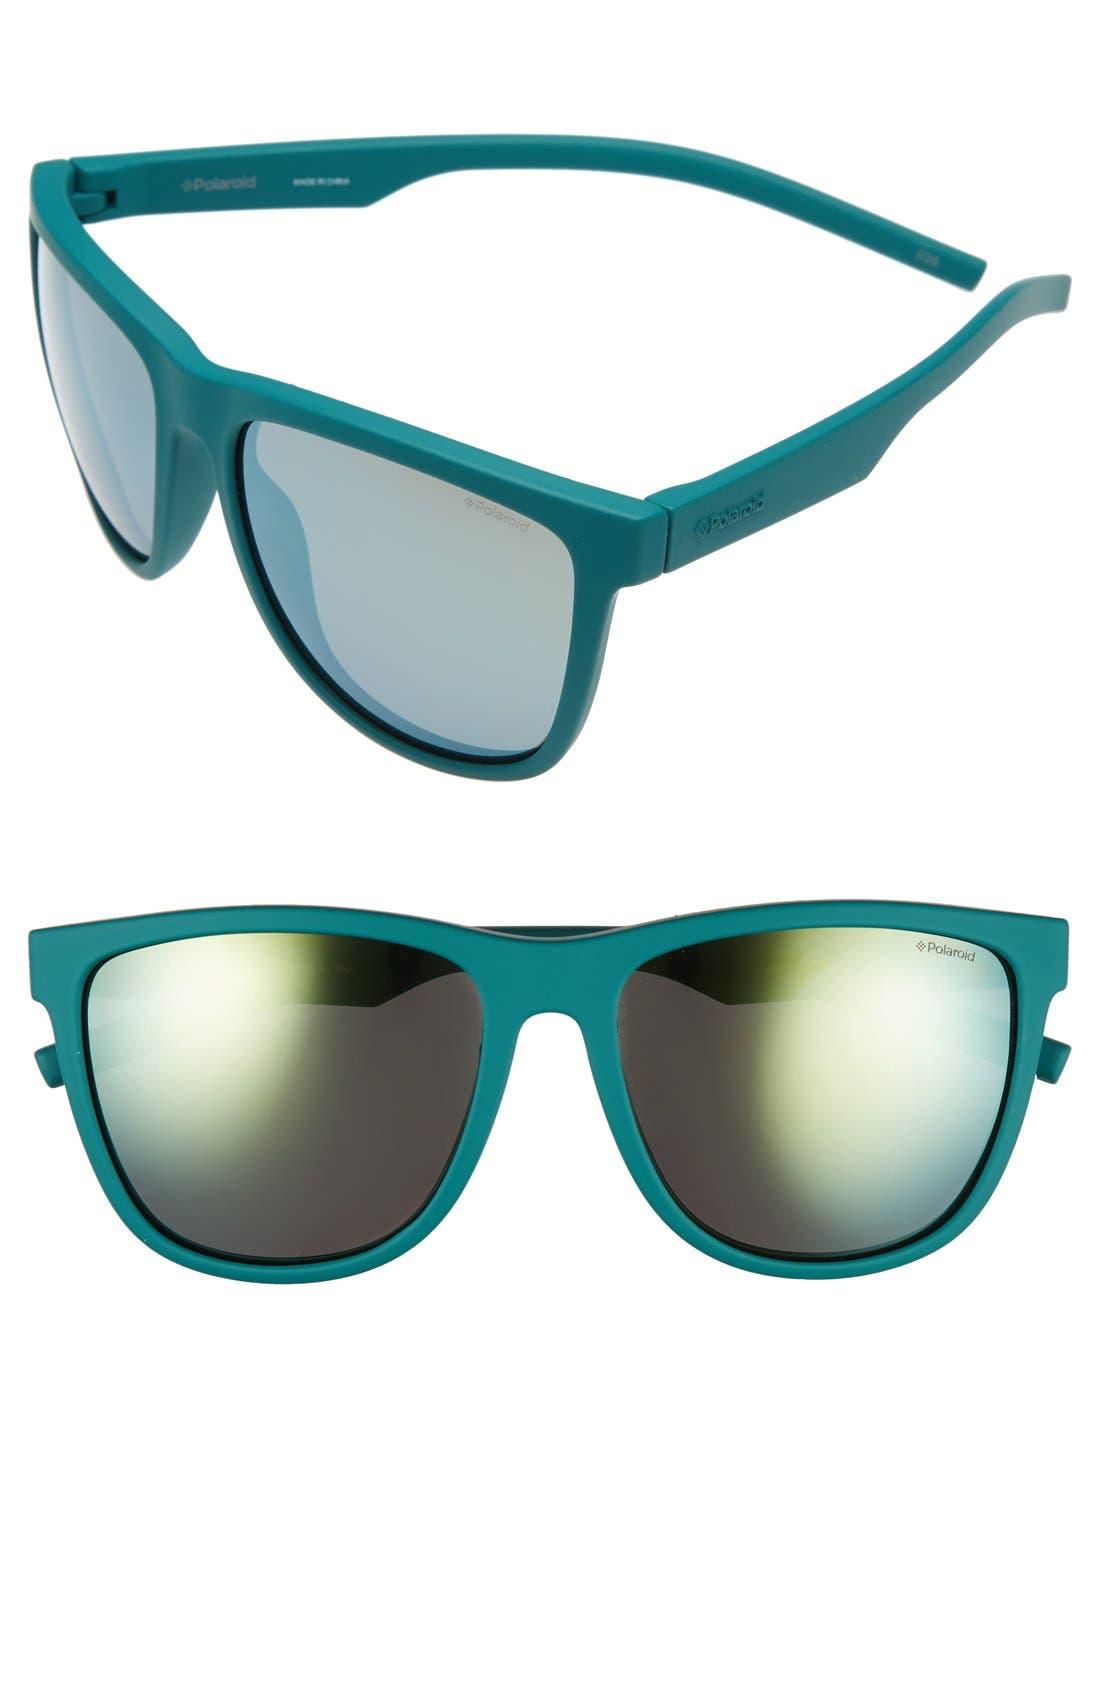 Alternate Image 1 Selected - Polaroid 56mm Retro Polarized Sunglasses